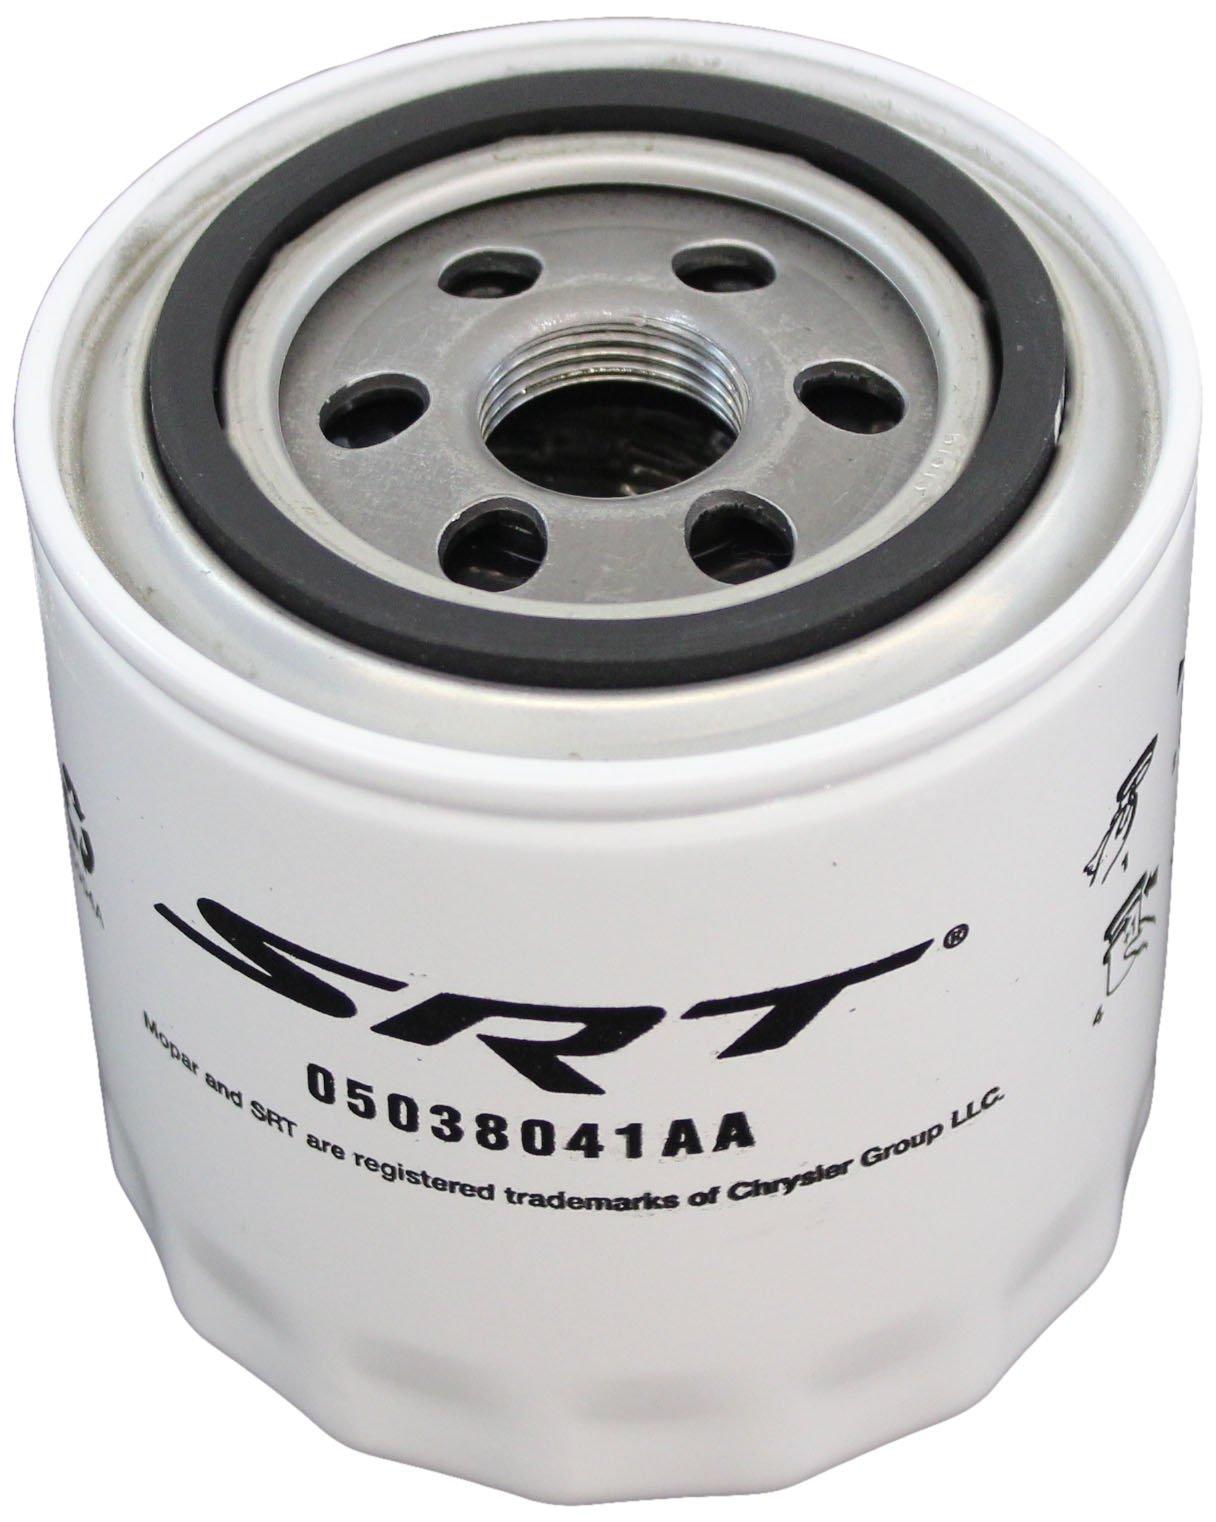 Genuine Mopar 5038041AA Oil Filter